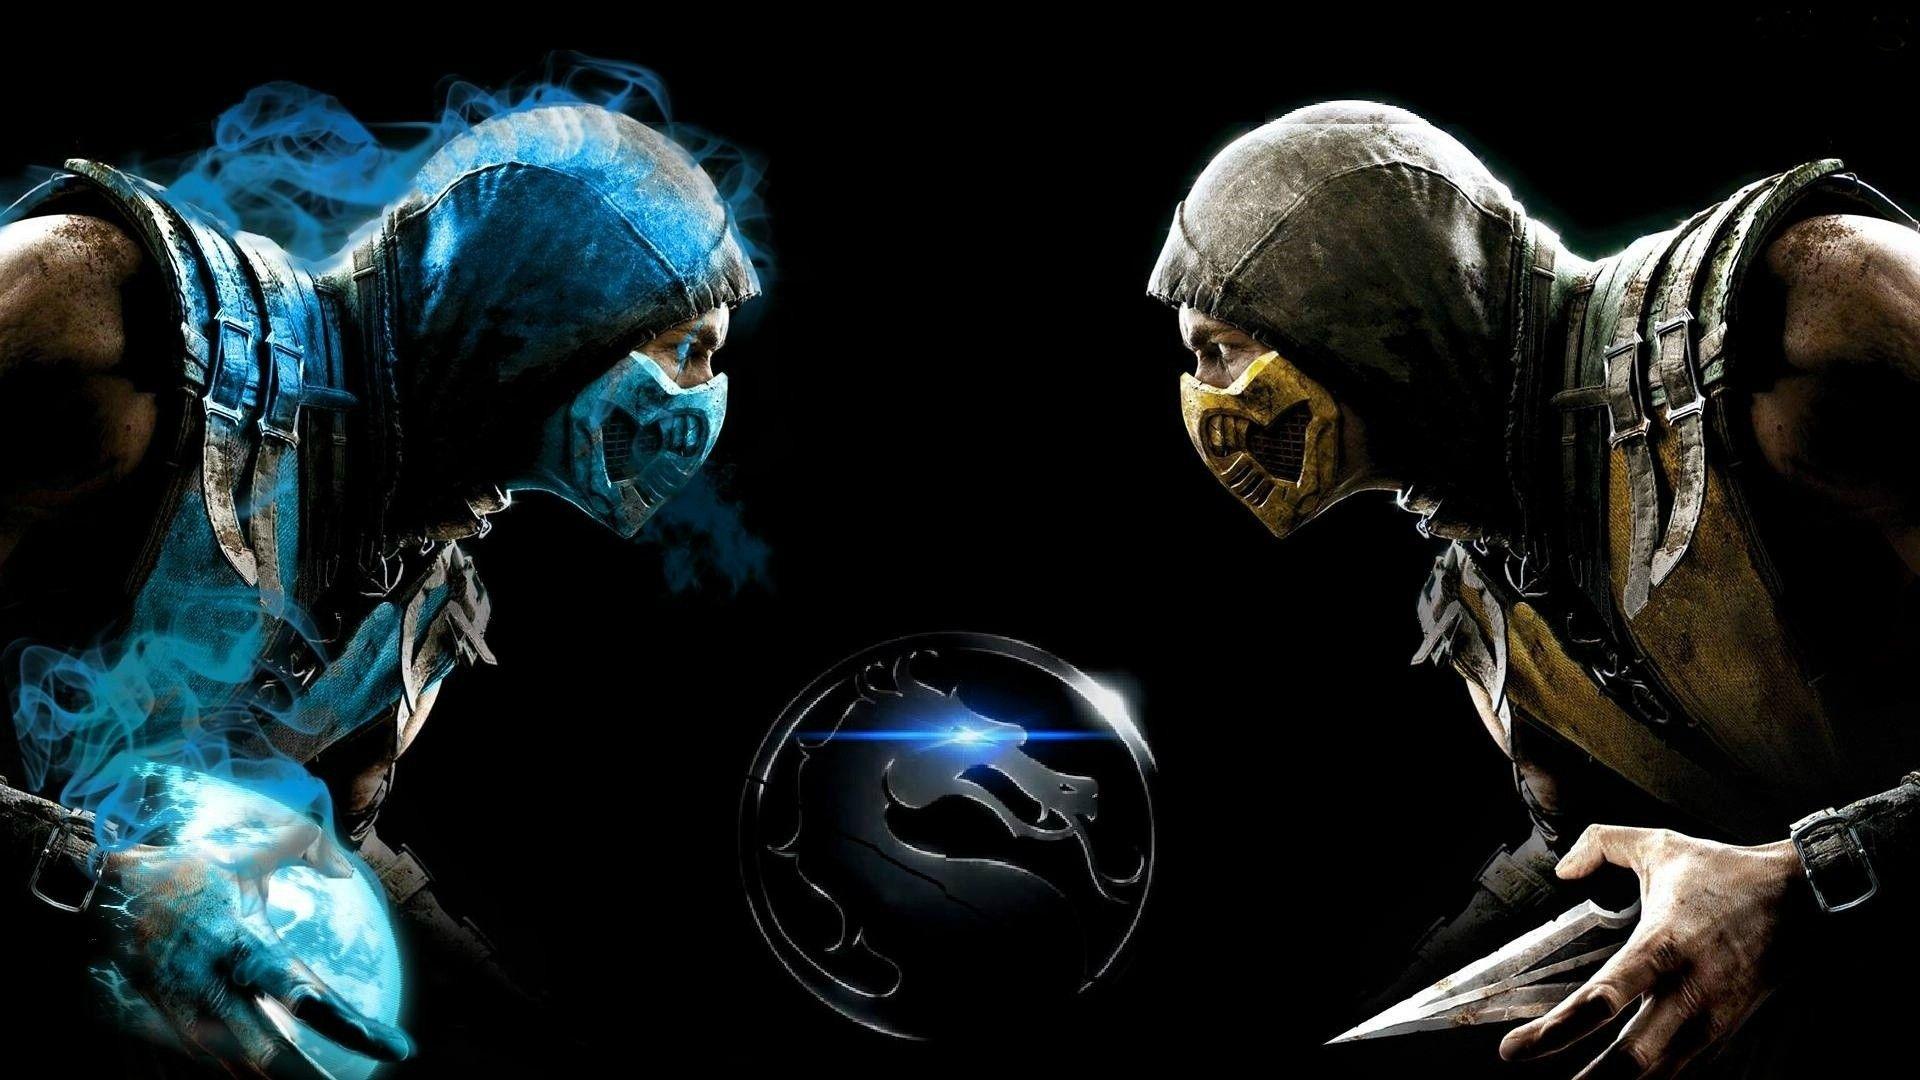 Mortal Kombat Xl Hd Wallpapers Theme Mortal Kombat X Scorpion